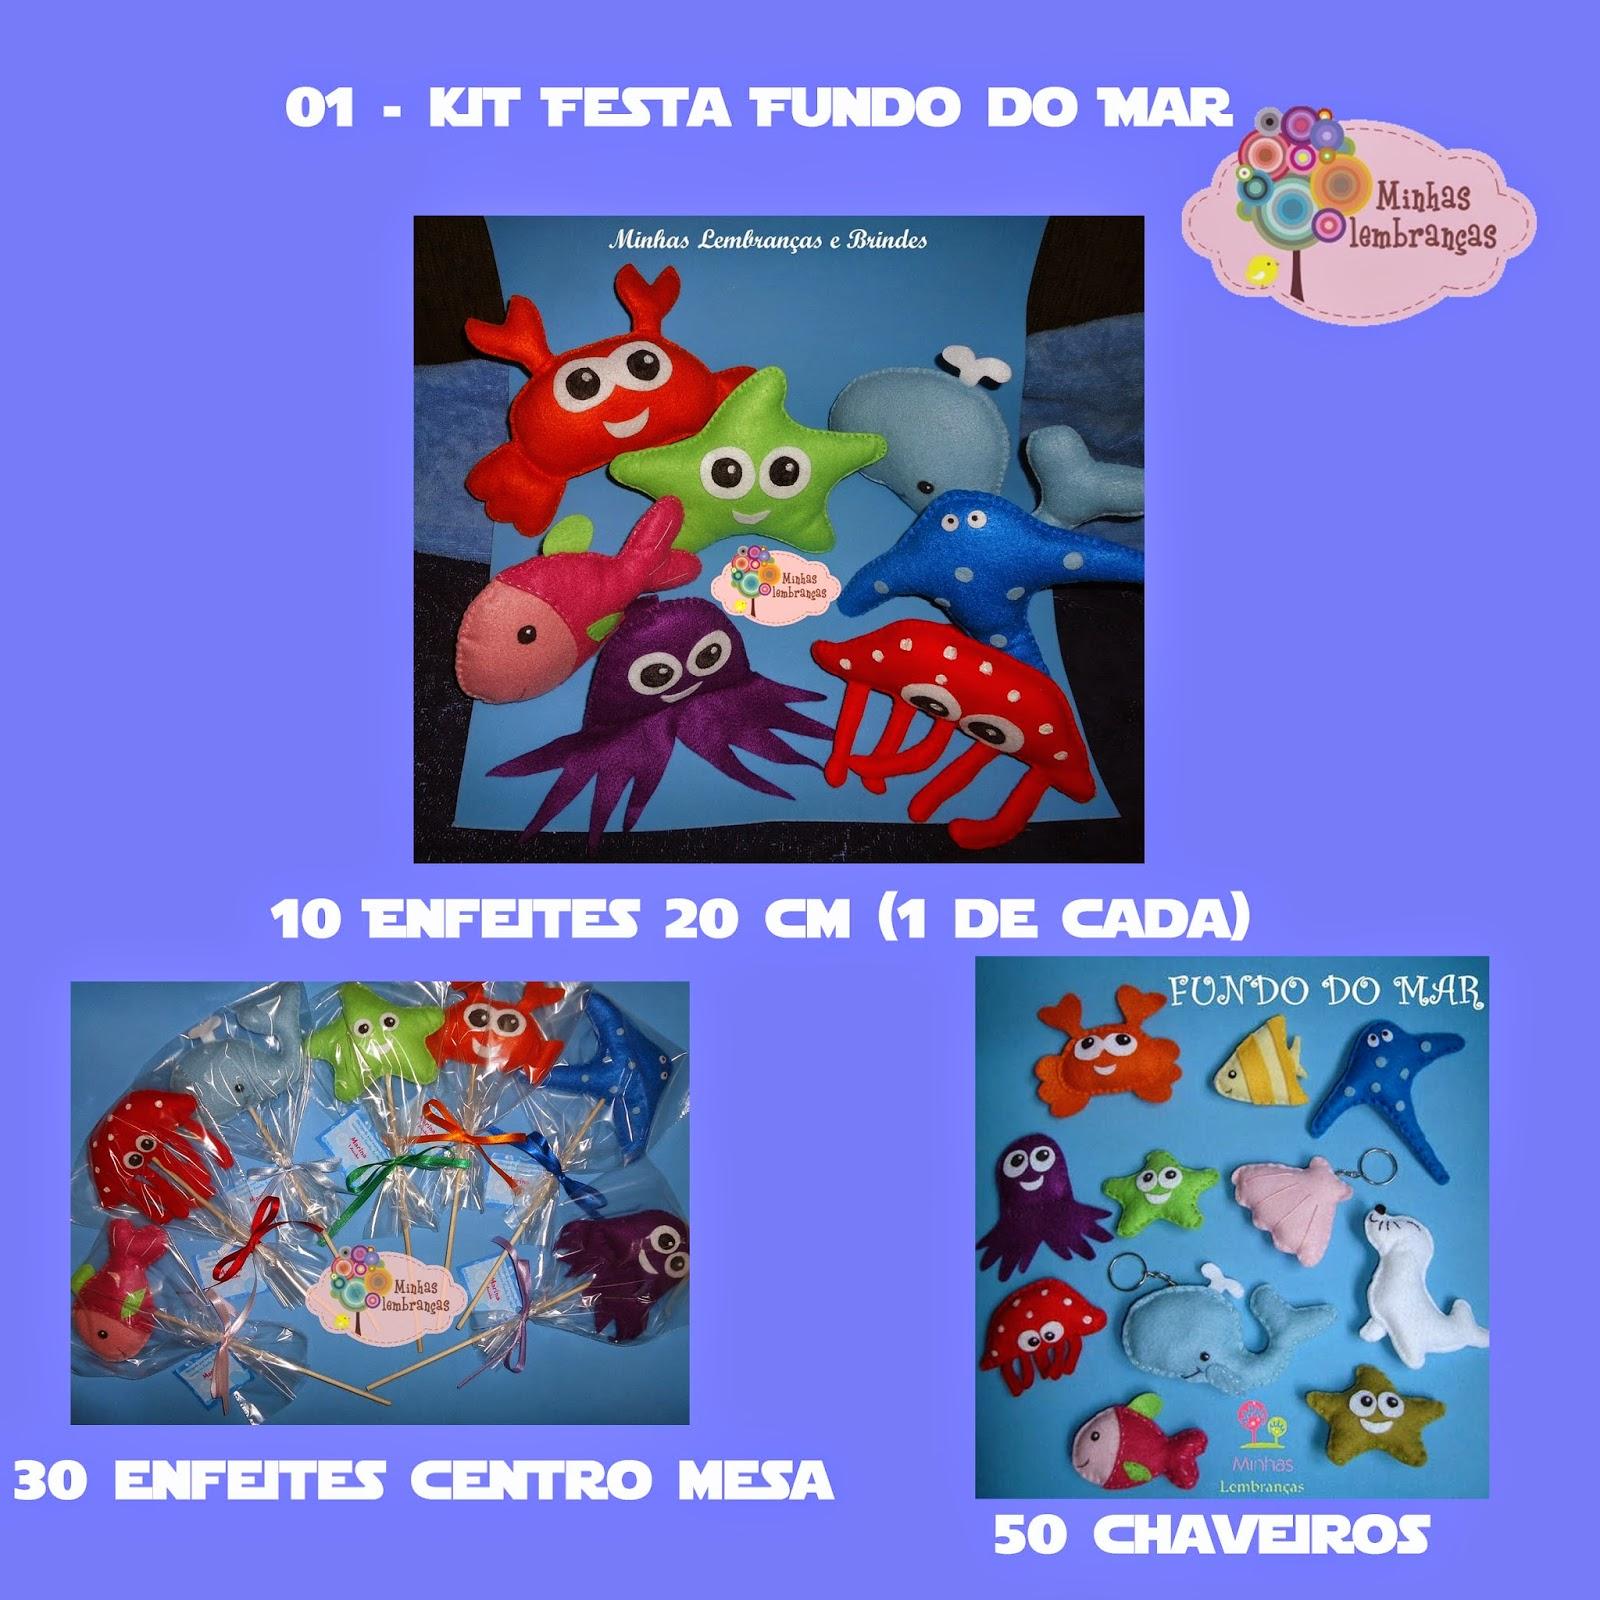 fundo-do-mar-kit-festa1-feltro-lembrancinhas-brinde